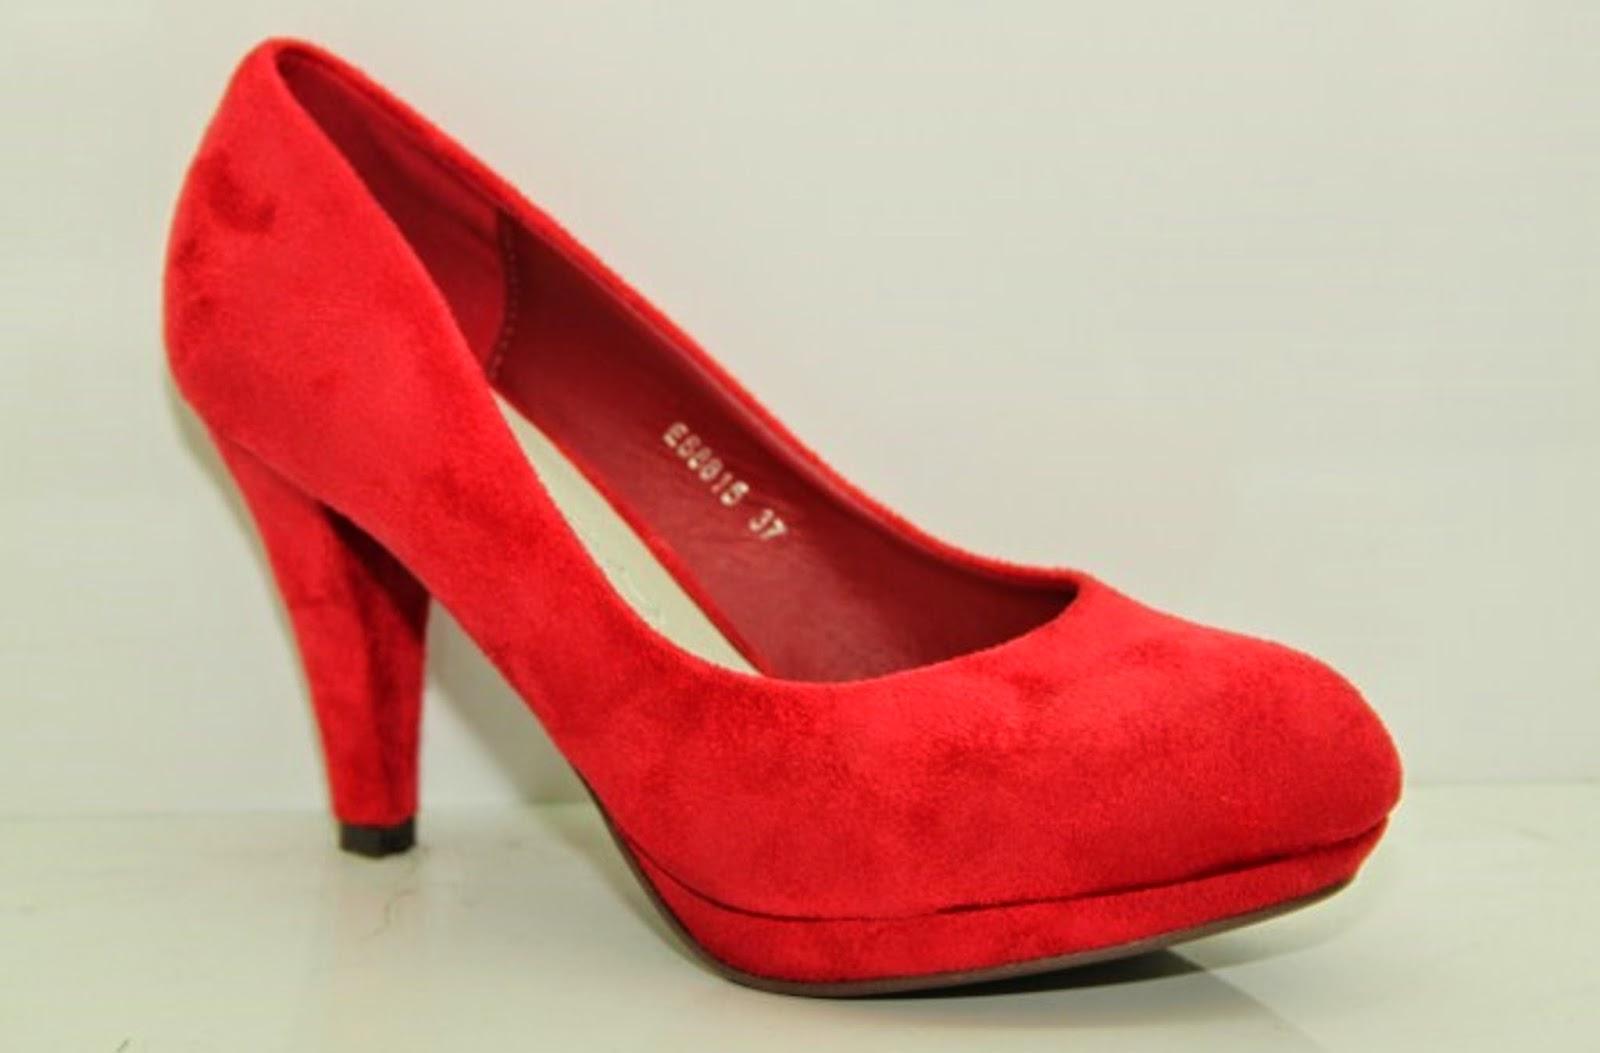 http://www.ebay.fr/itm/chaussures-femme-escarpins-vert-bleu-marron-taupe-noir-rouge-36-37-38-39-40-41-/301472806726?ssPageName=STRK:MESE:IT